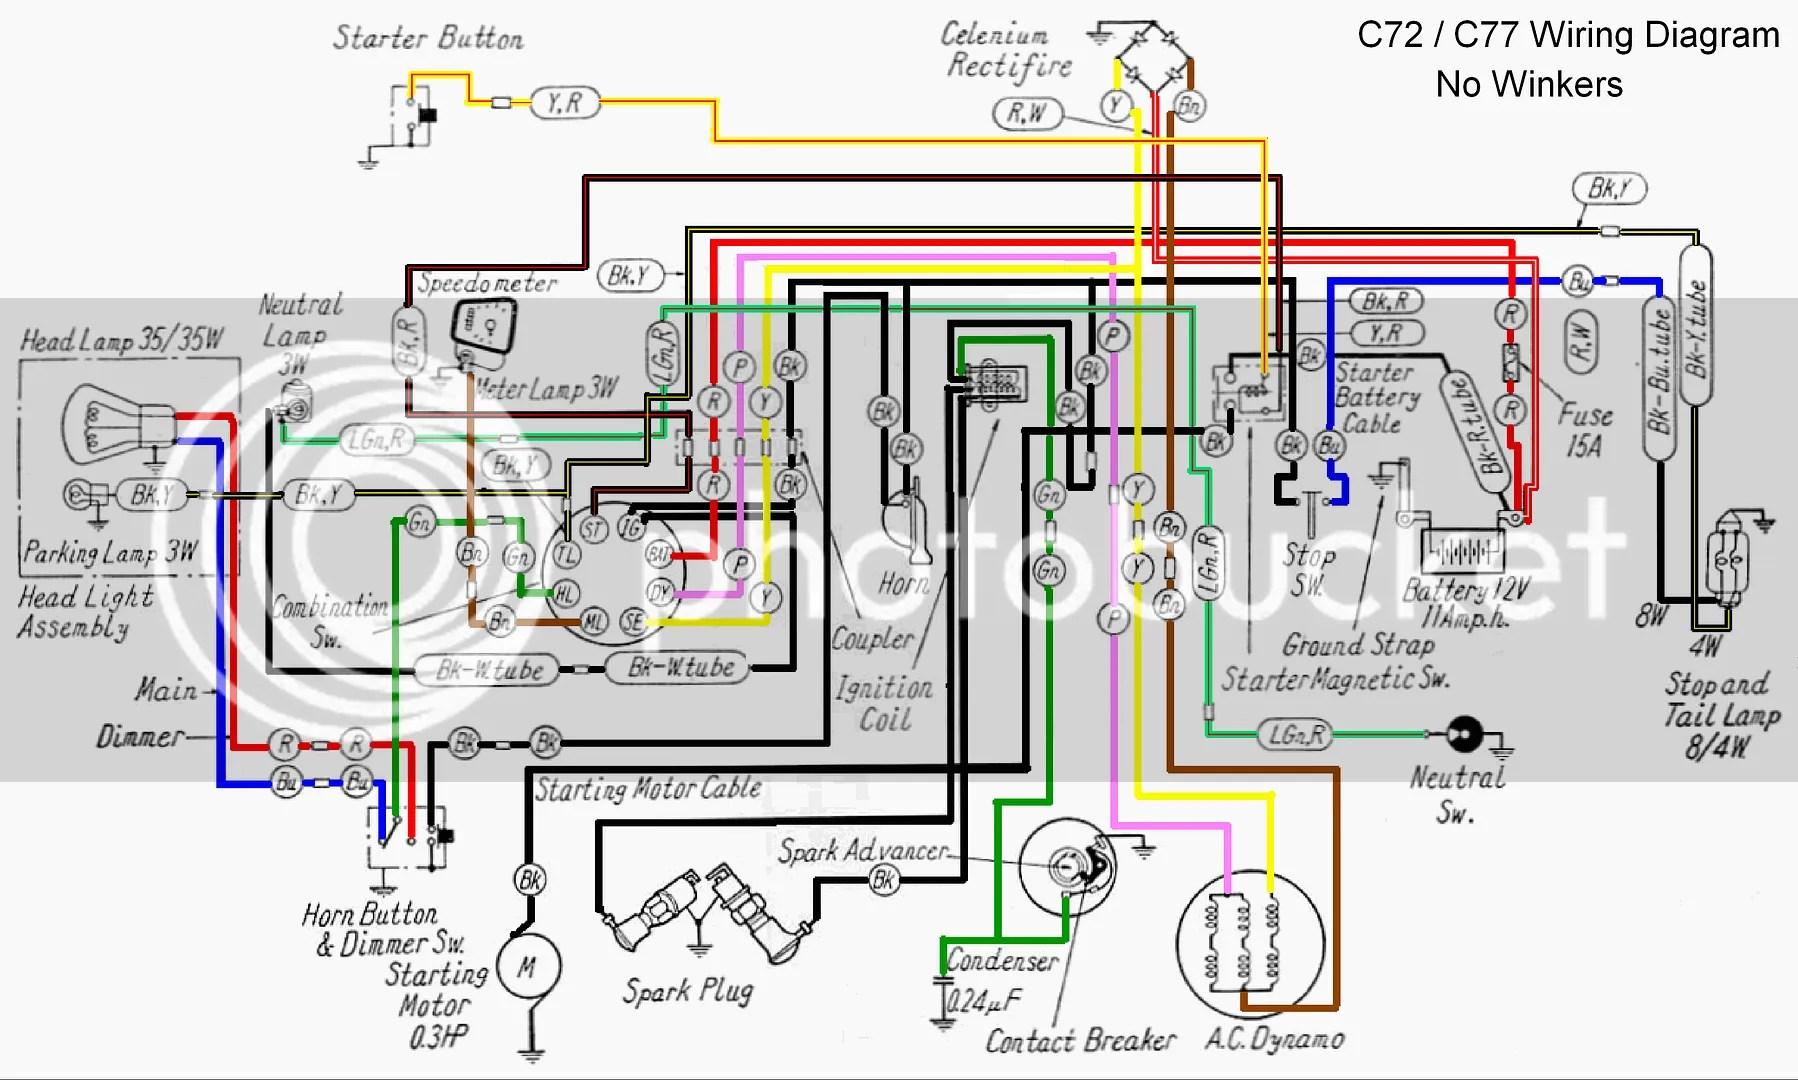 small resolution of honda dream wiring diagram wiring diagram yer1966 honda dream wiring diagram wiring diagram gol honda dream